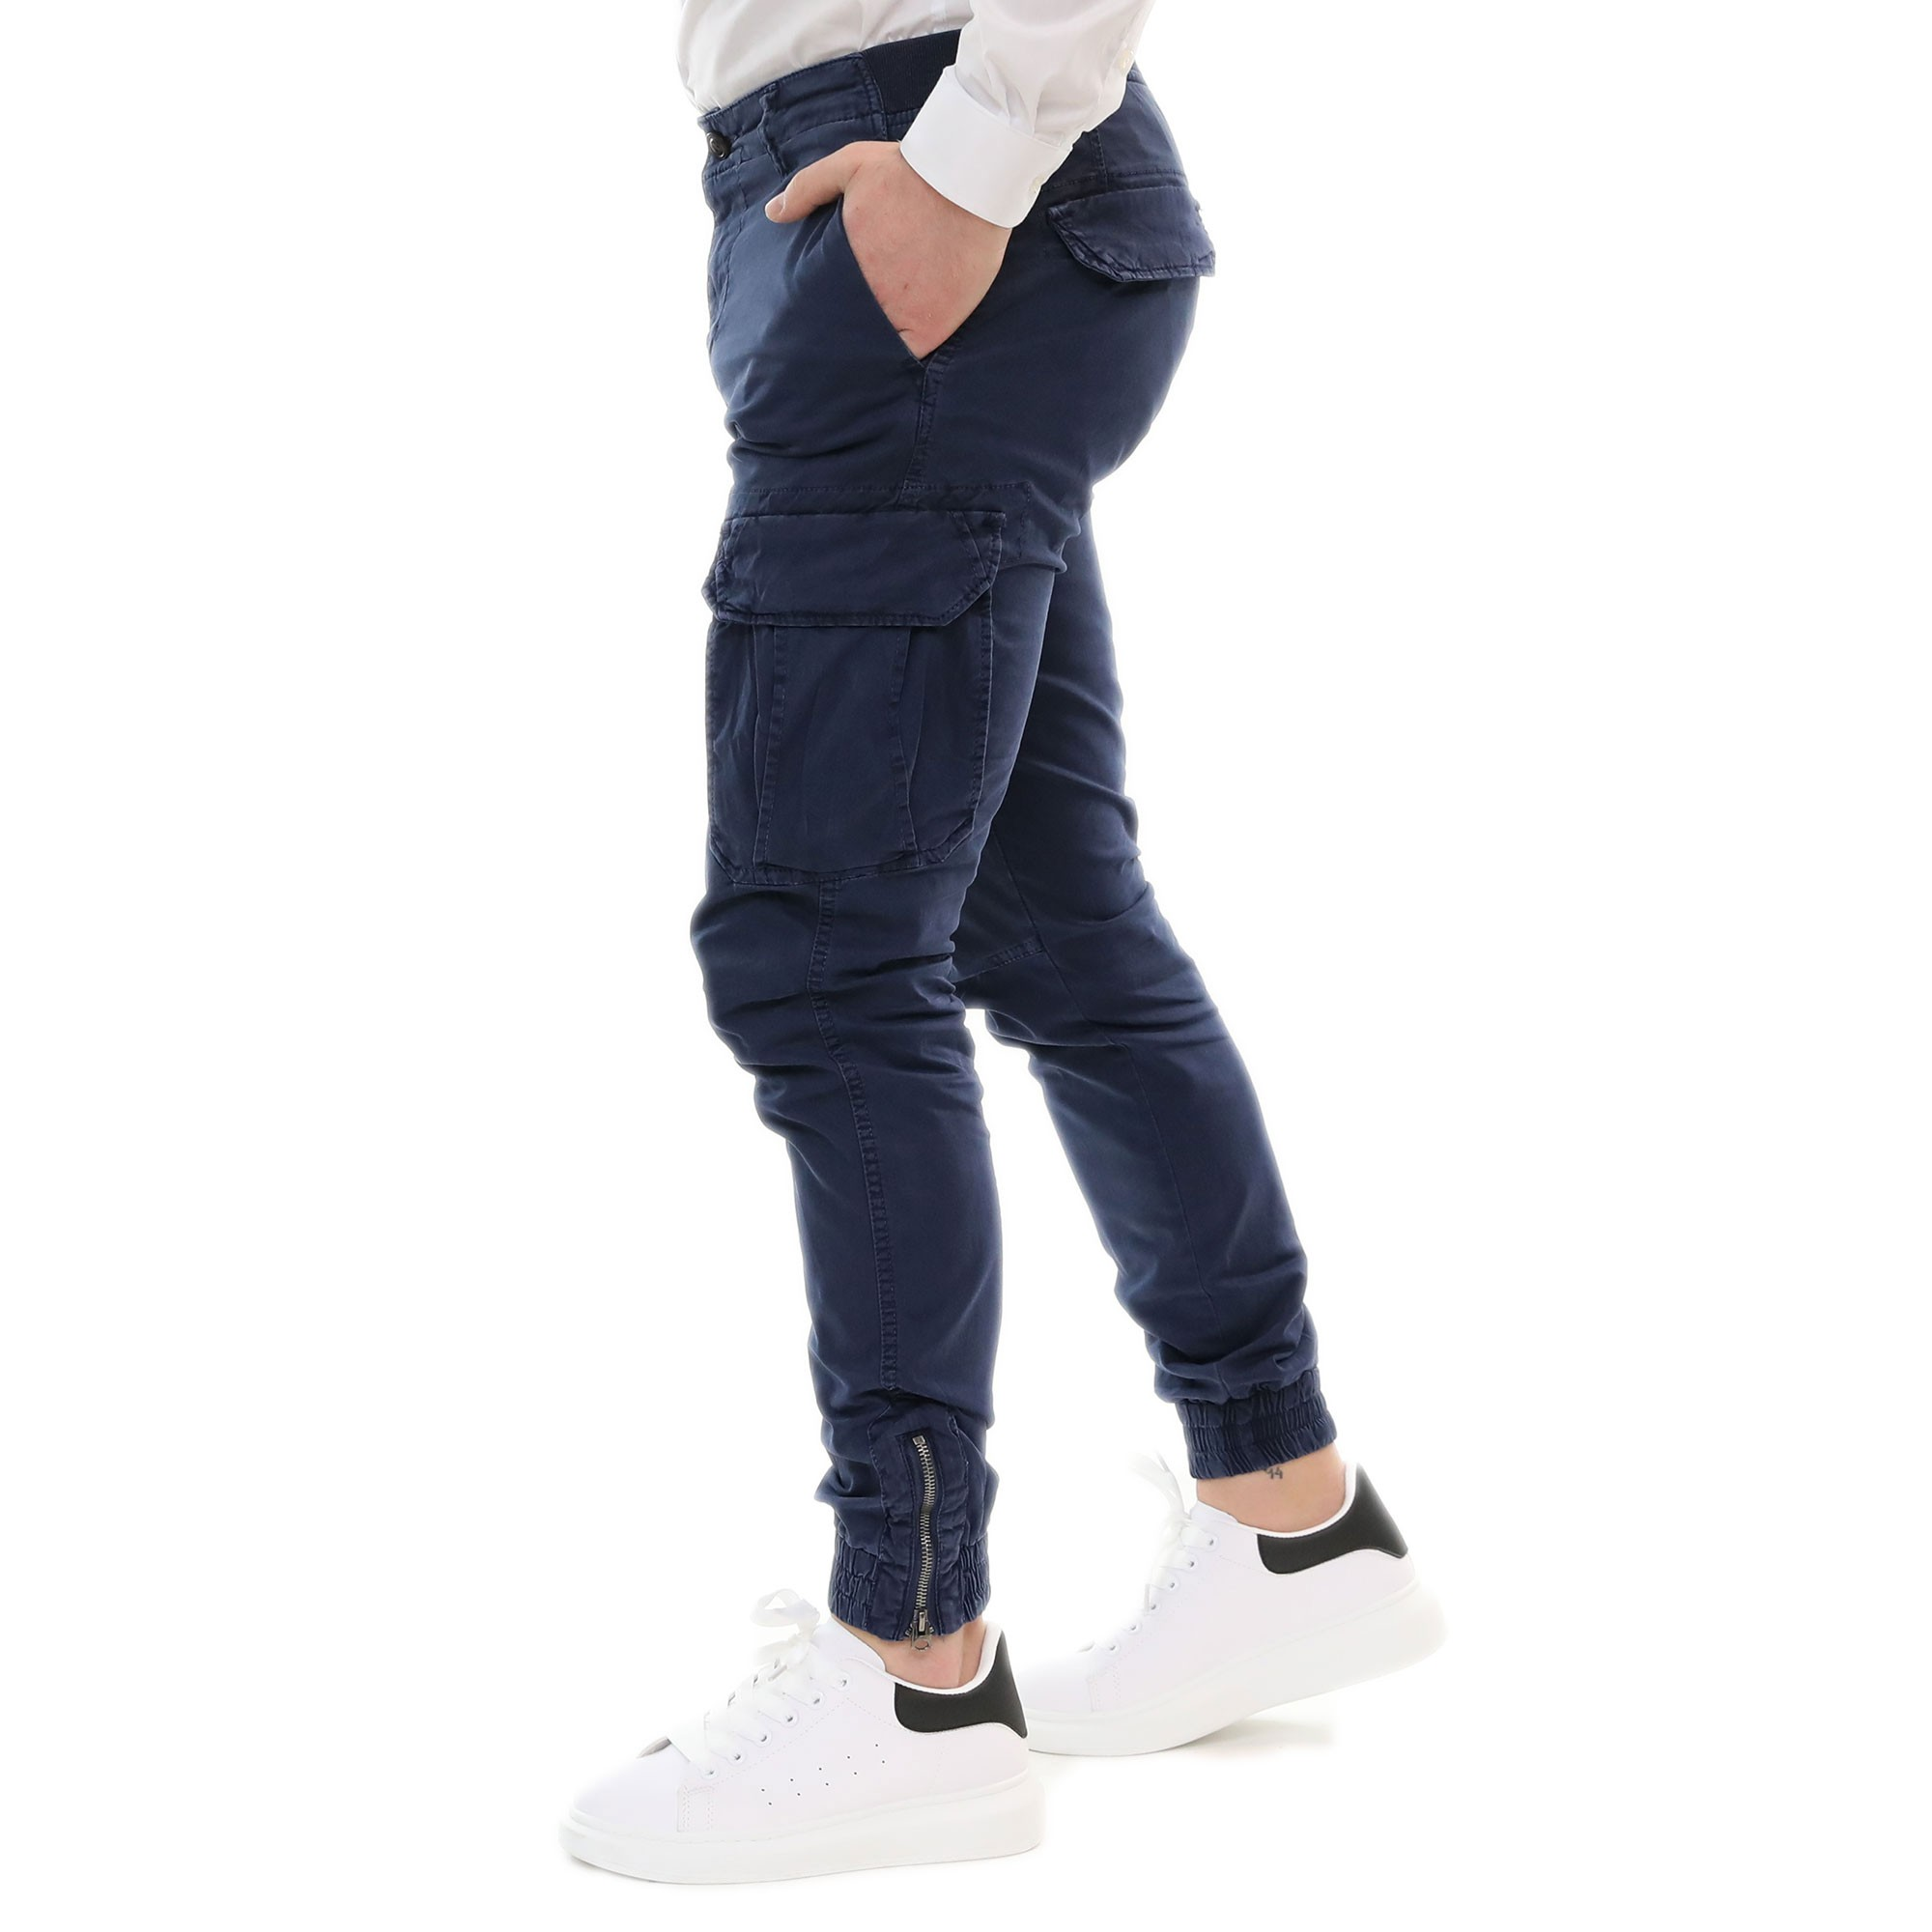 Pantalone-Uomo-Cargo-Primaverile-Con-Tasconi-Verde-Blu-Beige-SlimFit-Pantaloni miniatura 3